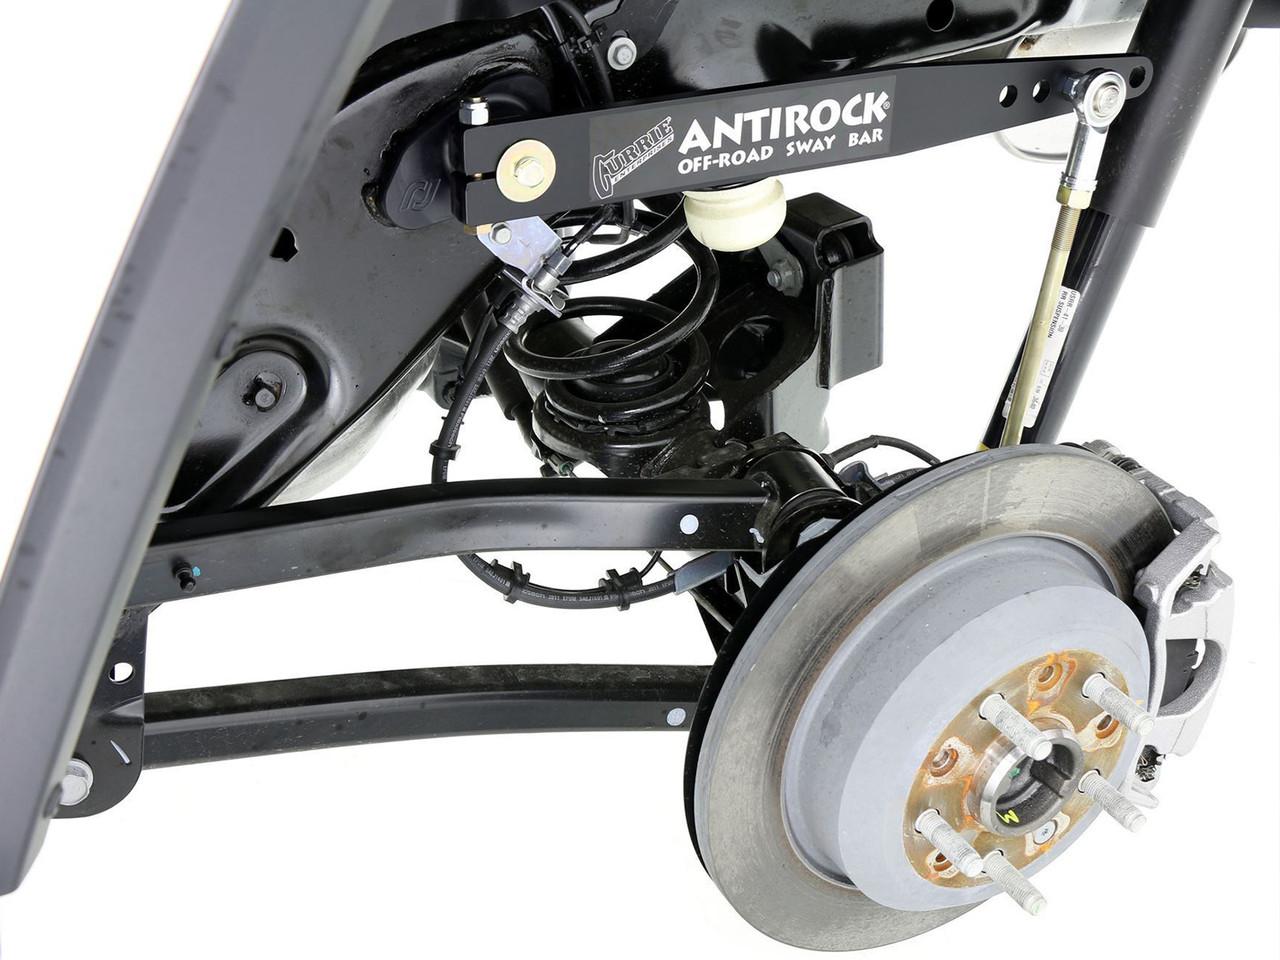 JL 2D or 4D Antirock® Rear Sway Bar Kit (Steel Arms)